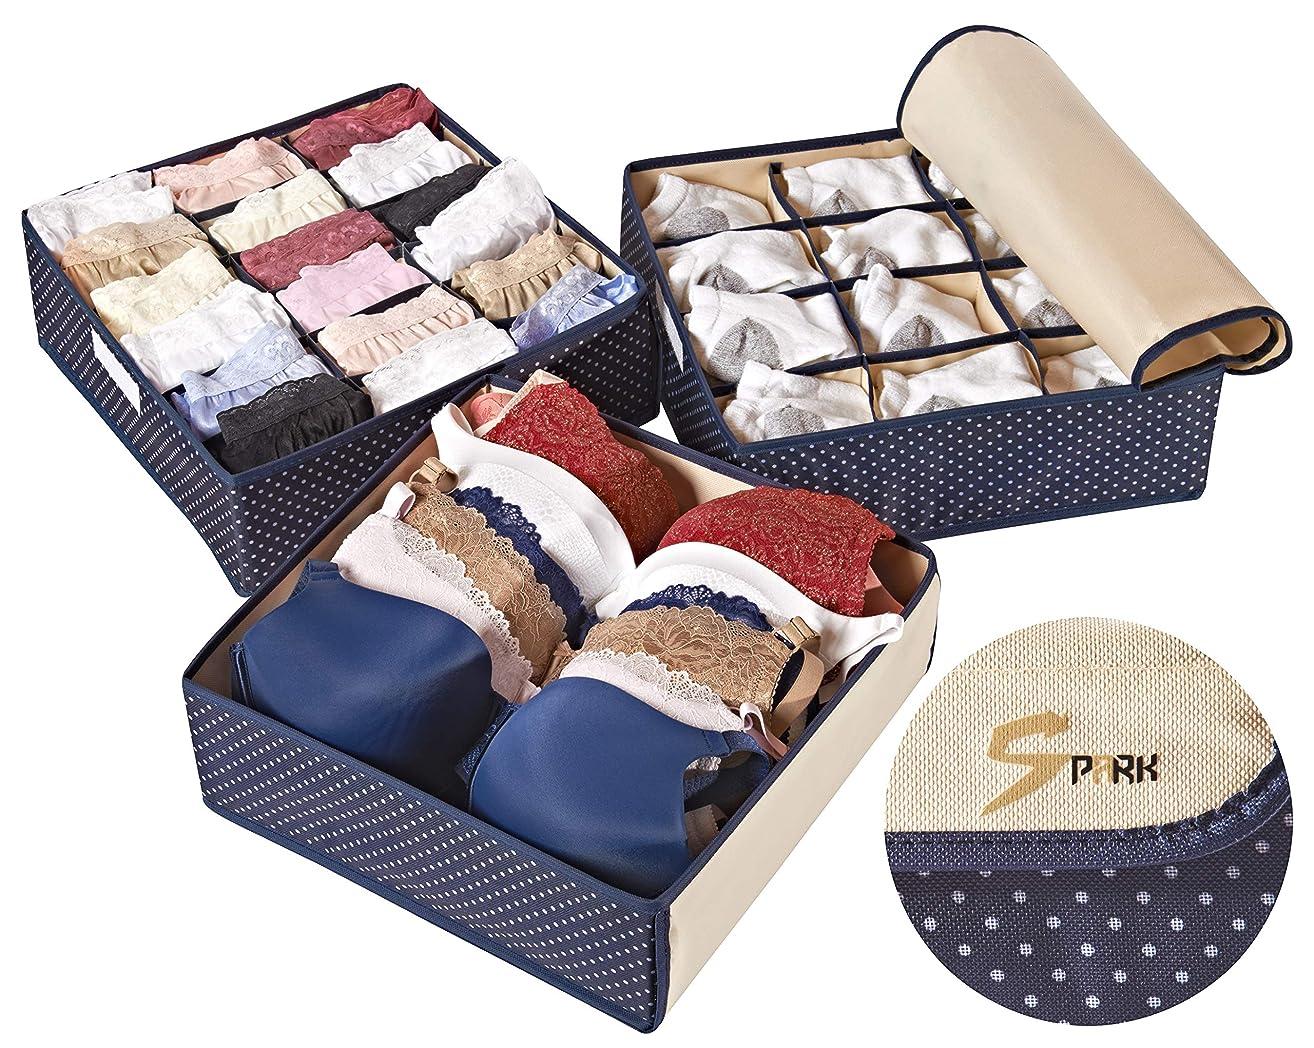 Topline Goods - Spark, Foldable, Covered Drawer Organizer, Closet Organizer, Drawer dividers for Socks, Baby Clothes, Belt, Tie, Bras for Women, Scarves, Bath Towels, Set of 3 (Blue)